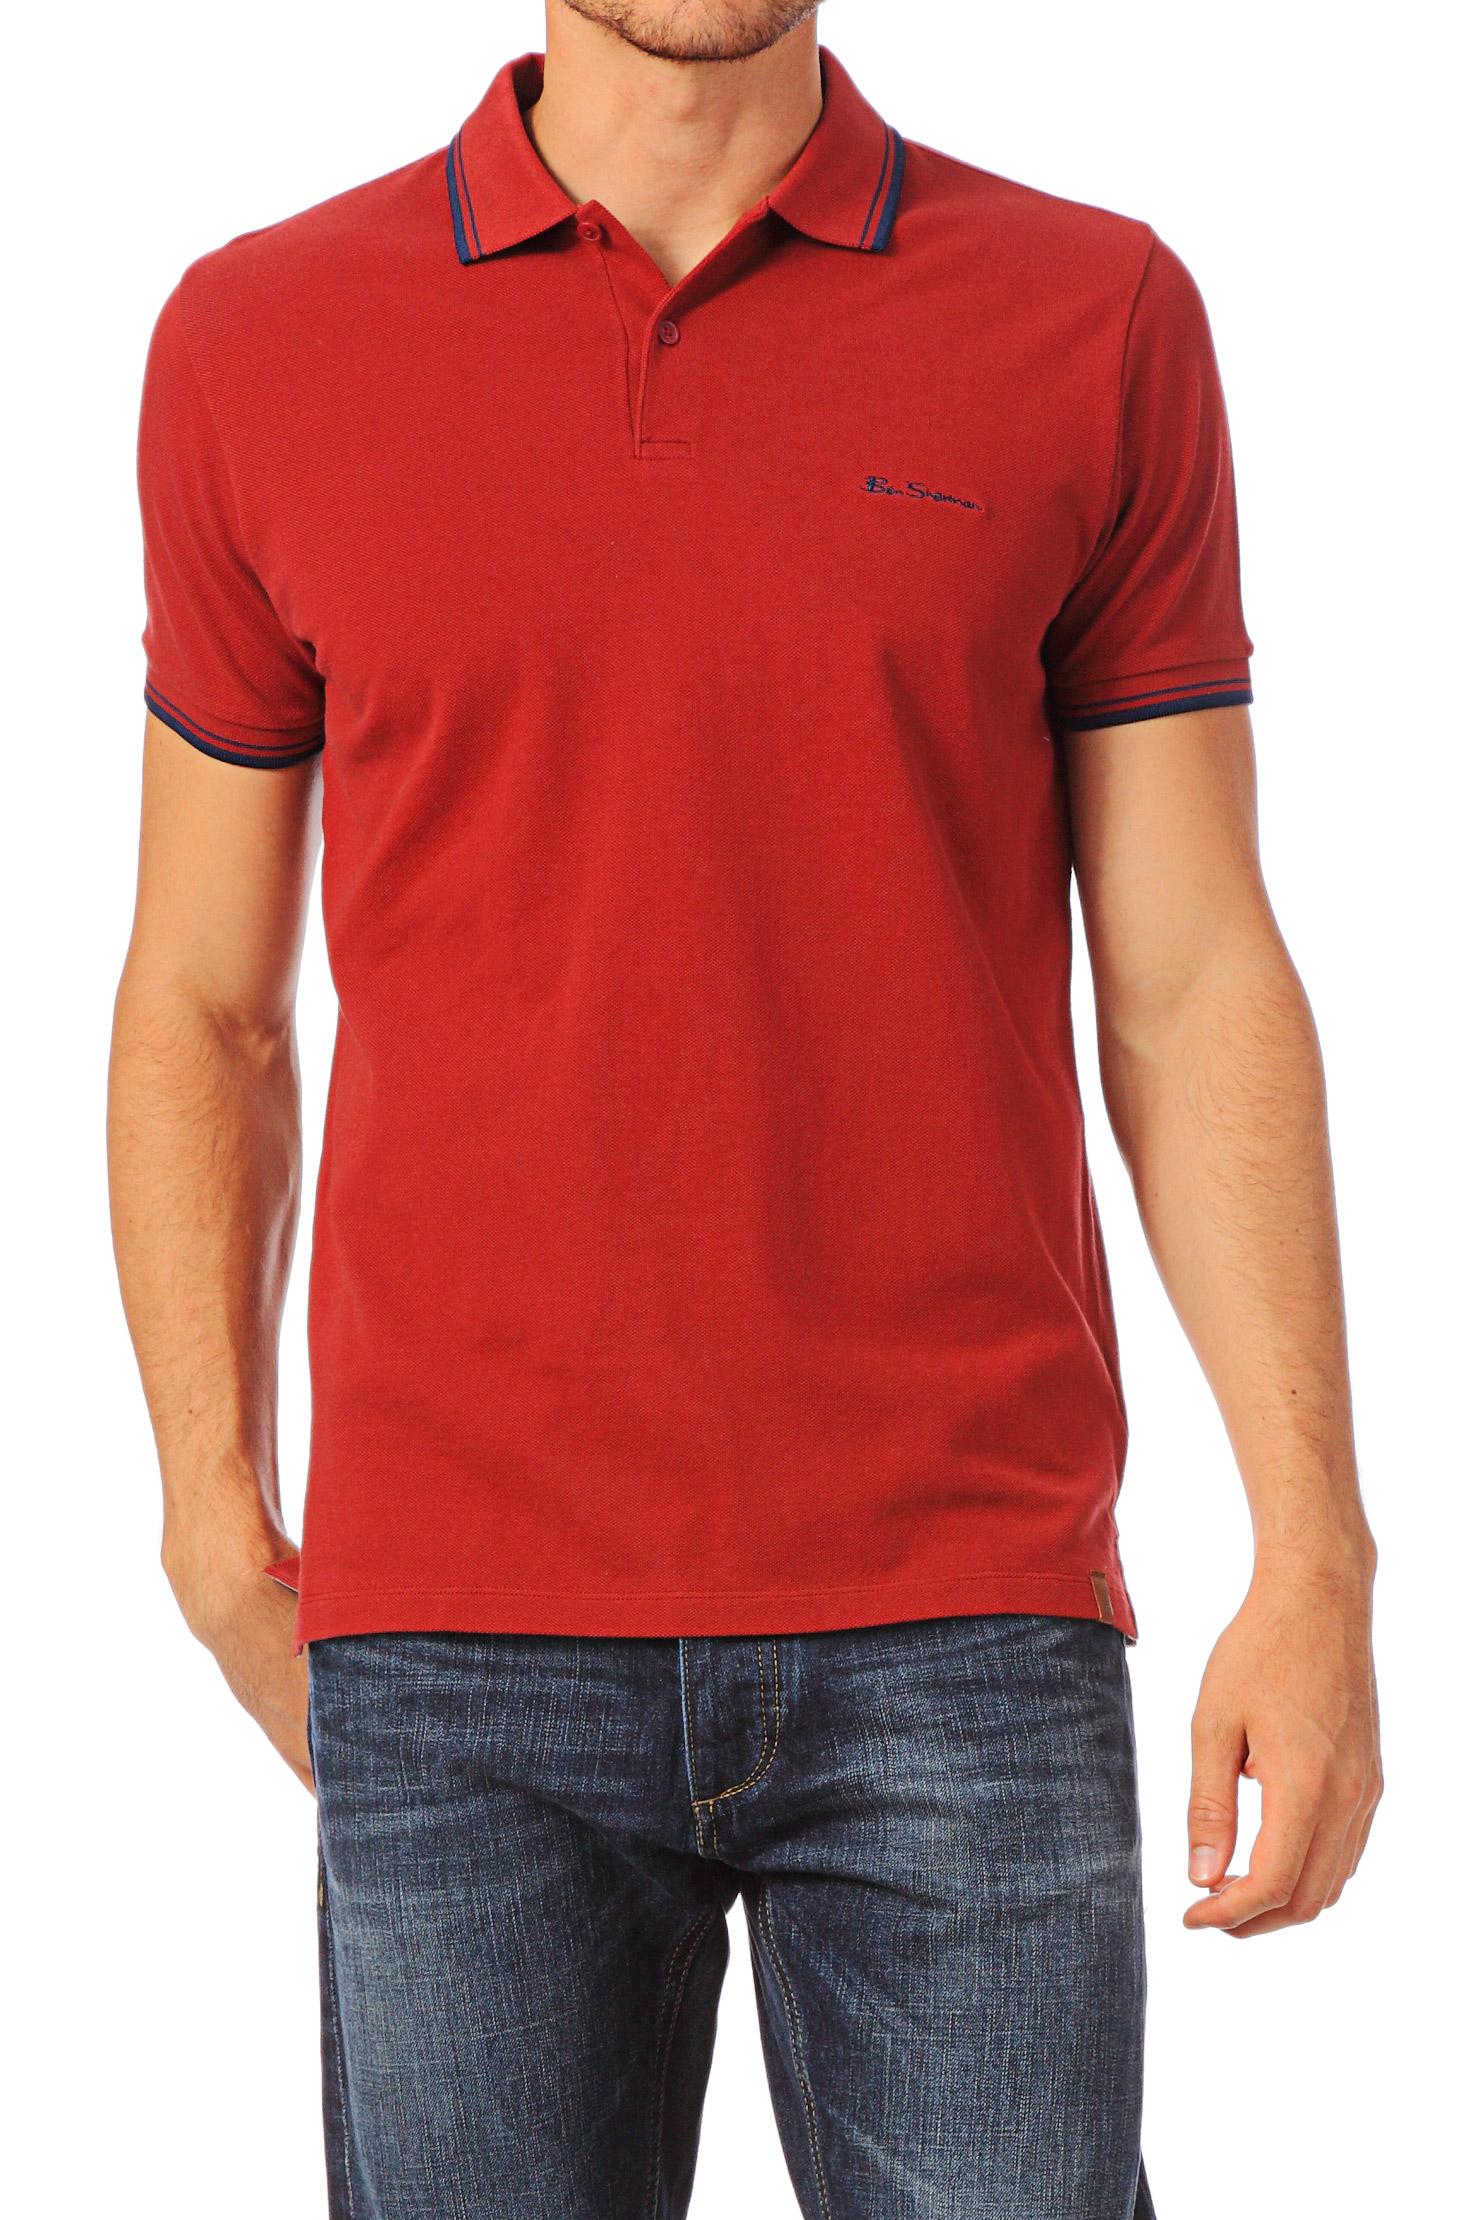 a533e3978 red polo shirts for men - Ecosia